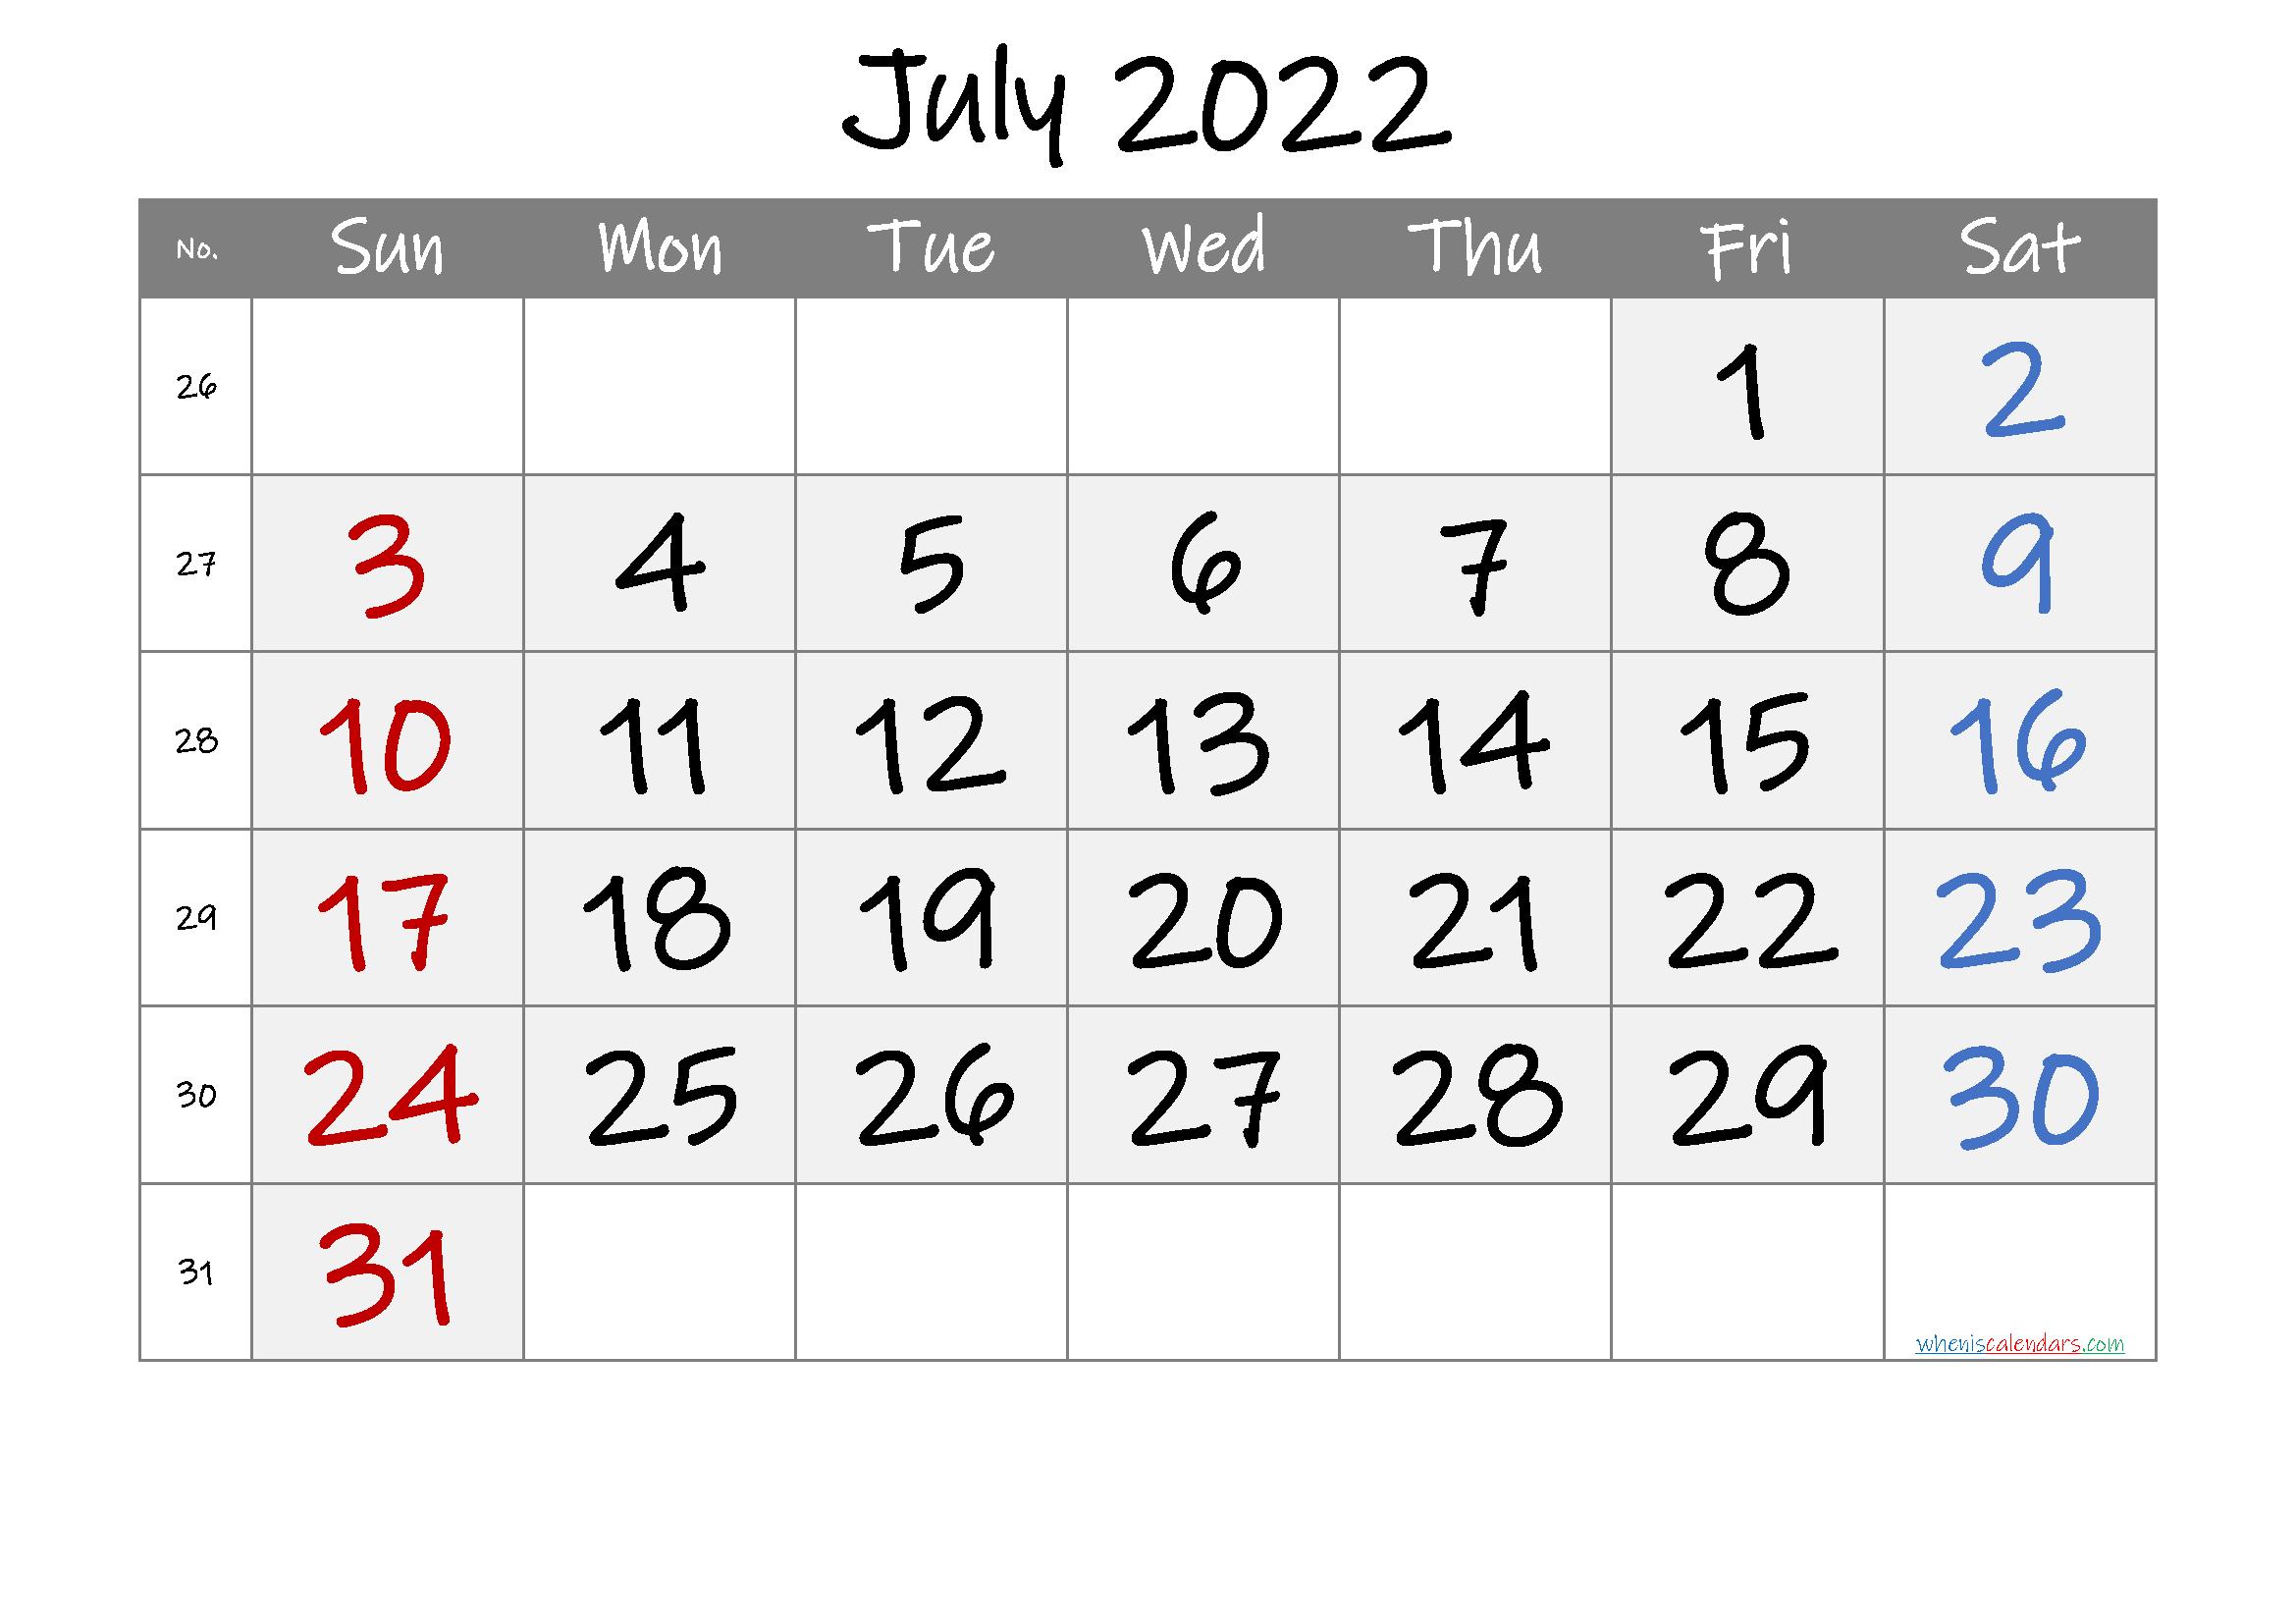 Printable July 2022 Calendar intended for Blank Calendar Template July 2022